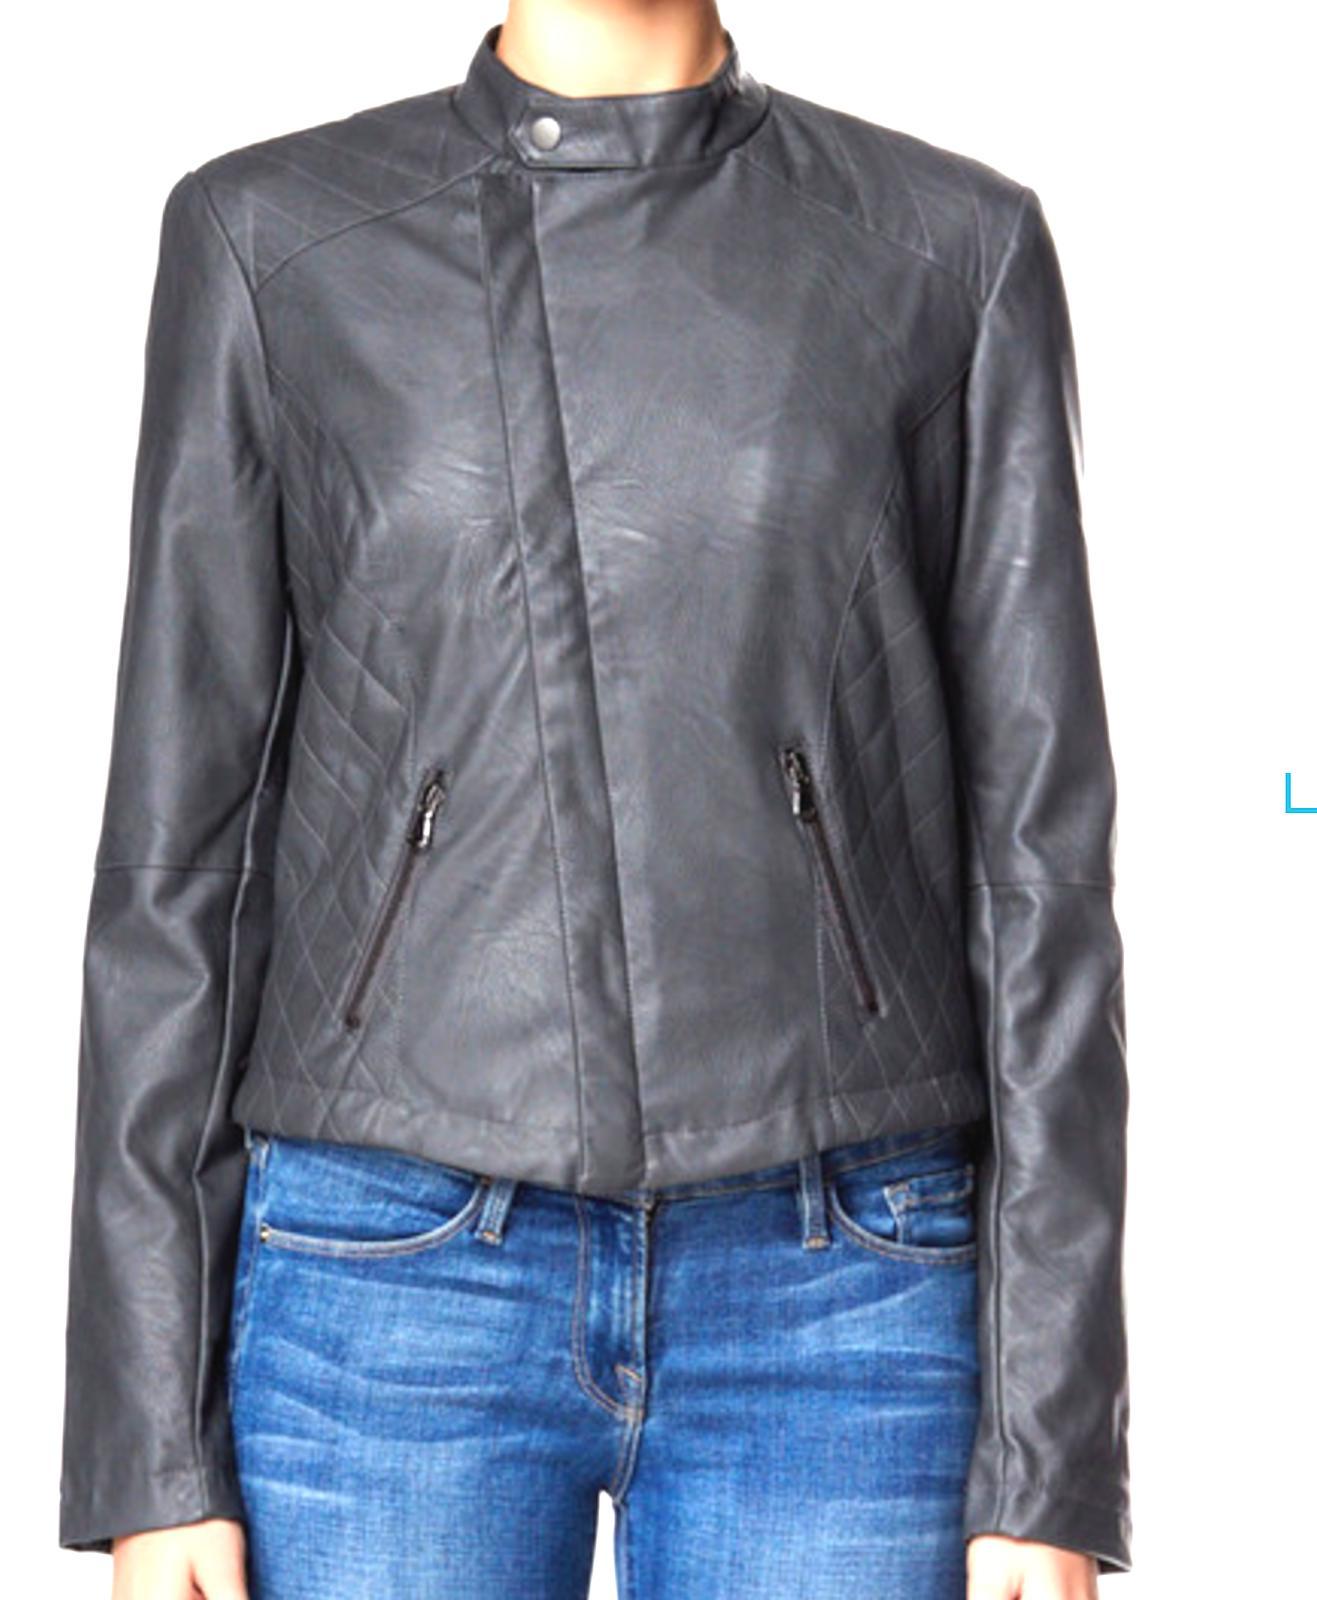 Tart Collections Moto Jacket Steel Med MSRP NWT